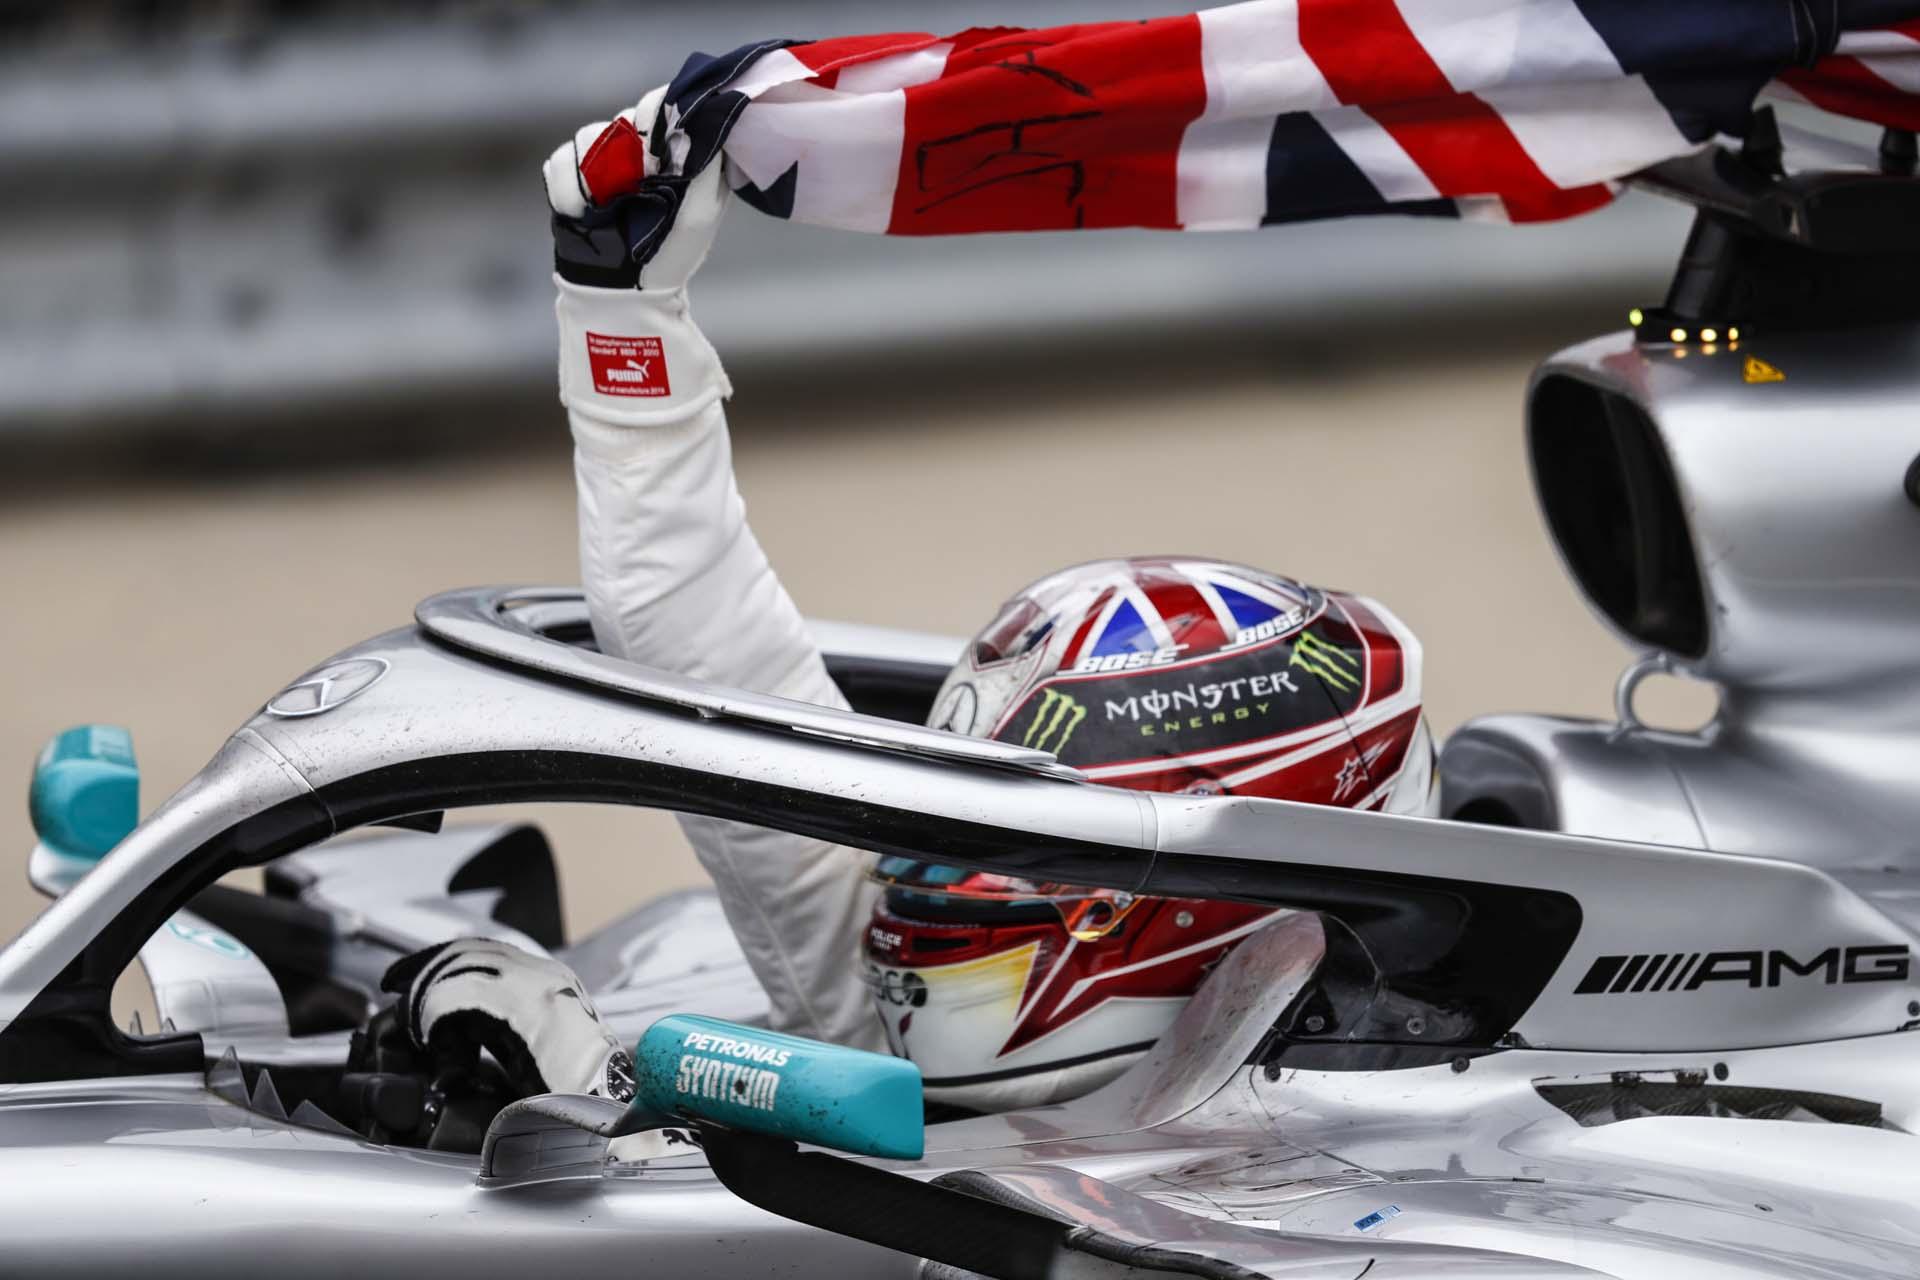 2019 British Grand Prix, Sunday - LAT Images Lewis Hamilton Mercedes british flag union jack